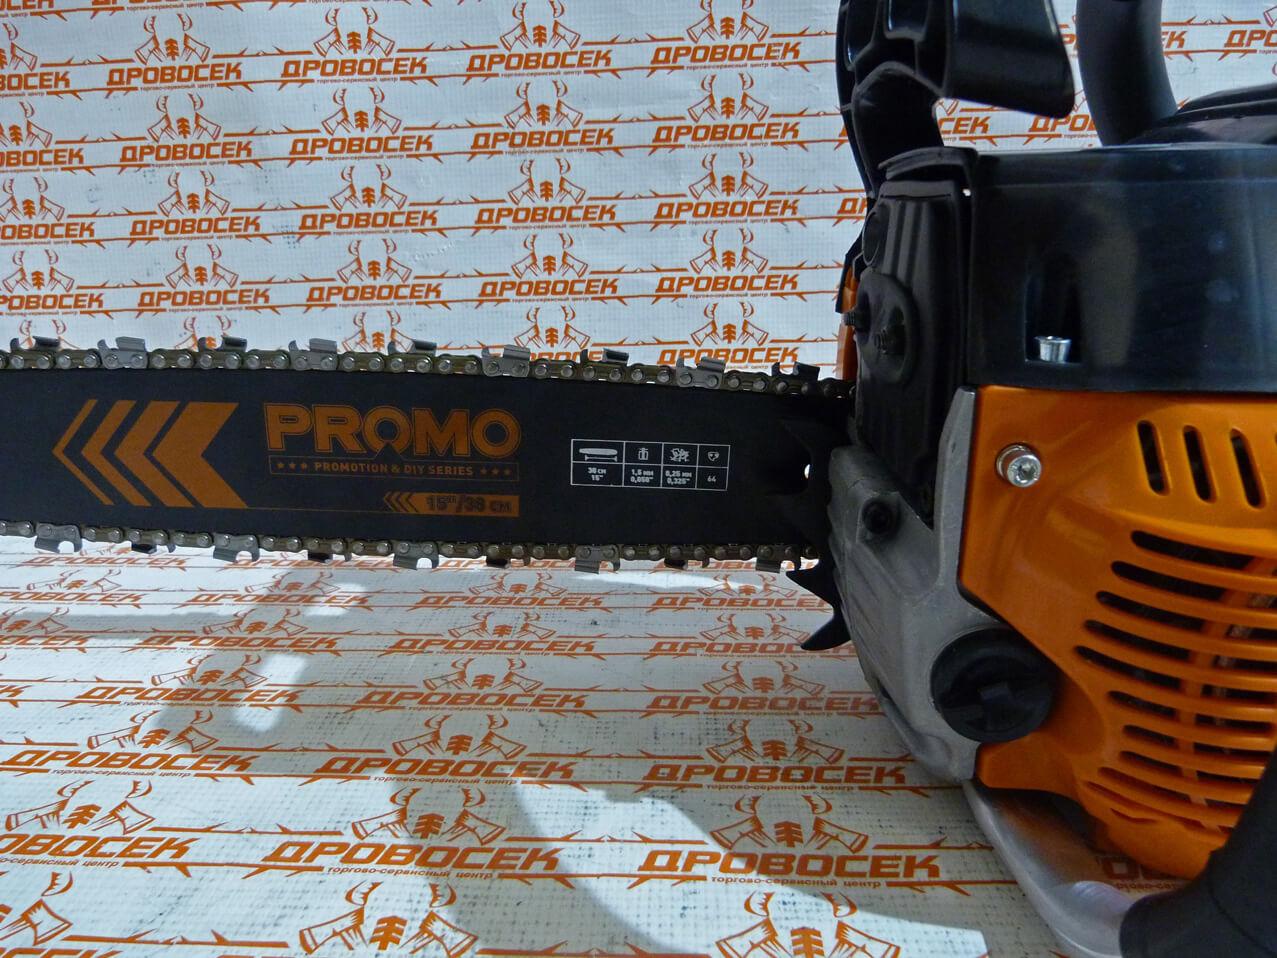 Бензопила carver promo psg-45-15: характеристики, отзывы, цена, аналоги